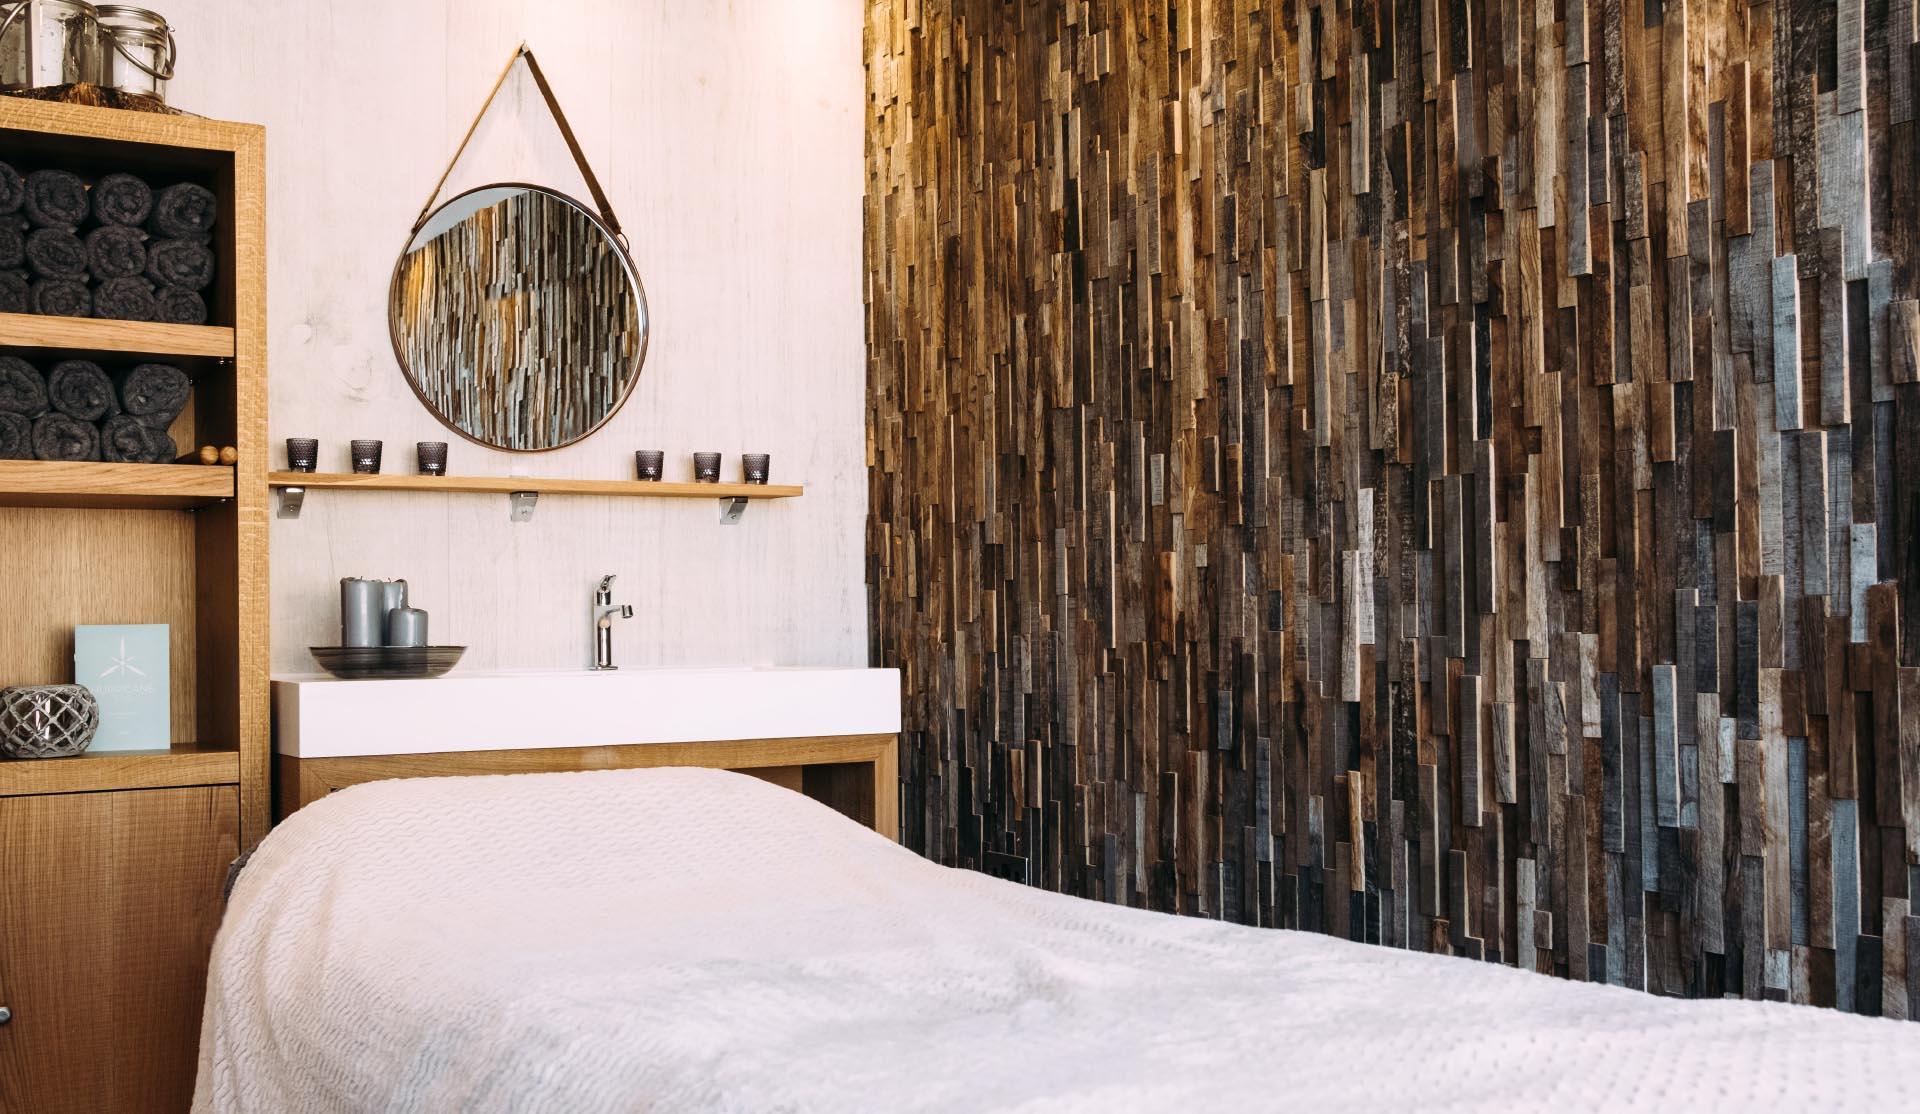 Silverlake-Dorset-Spa-Rustic-Treatment-room-design